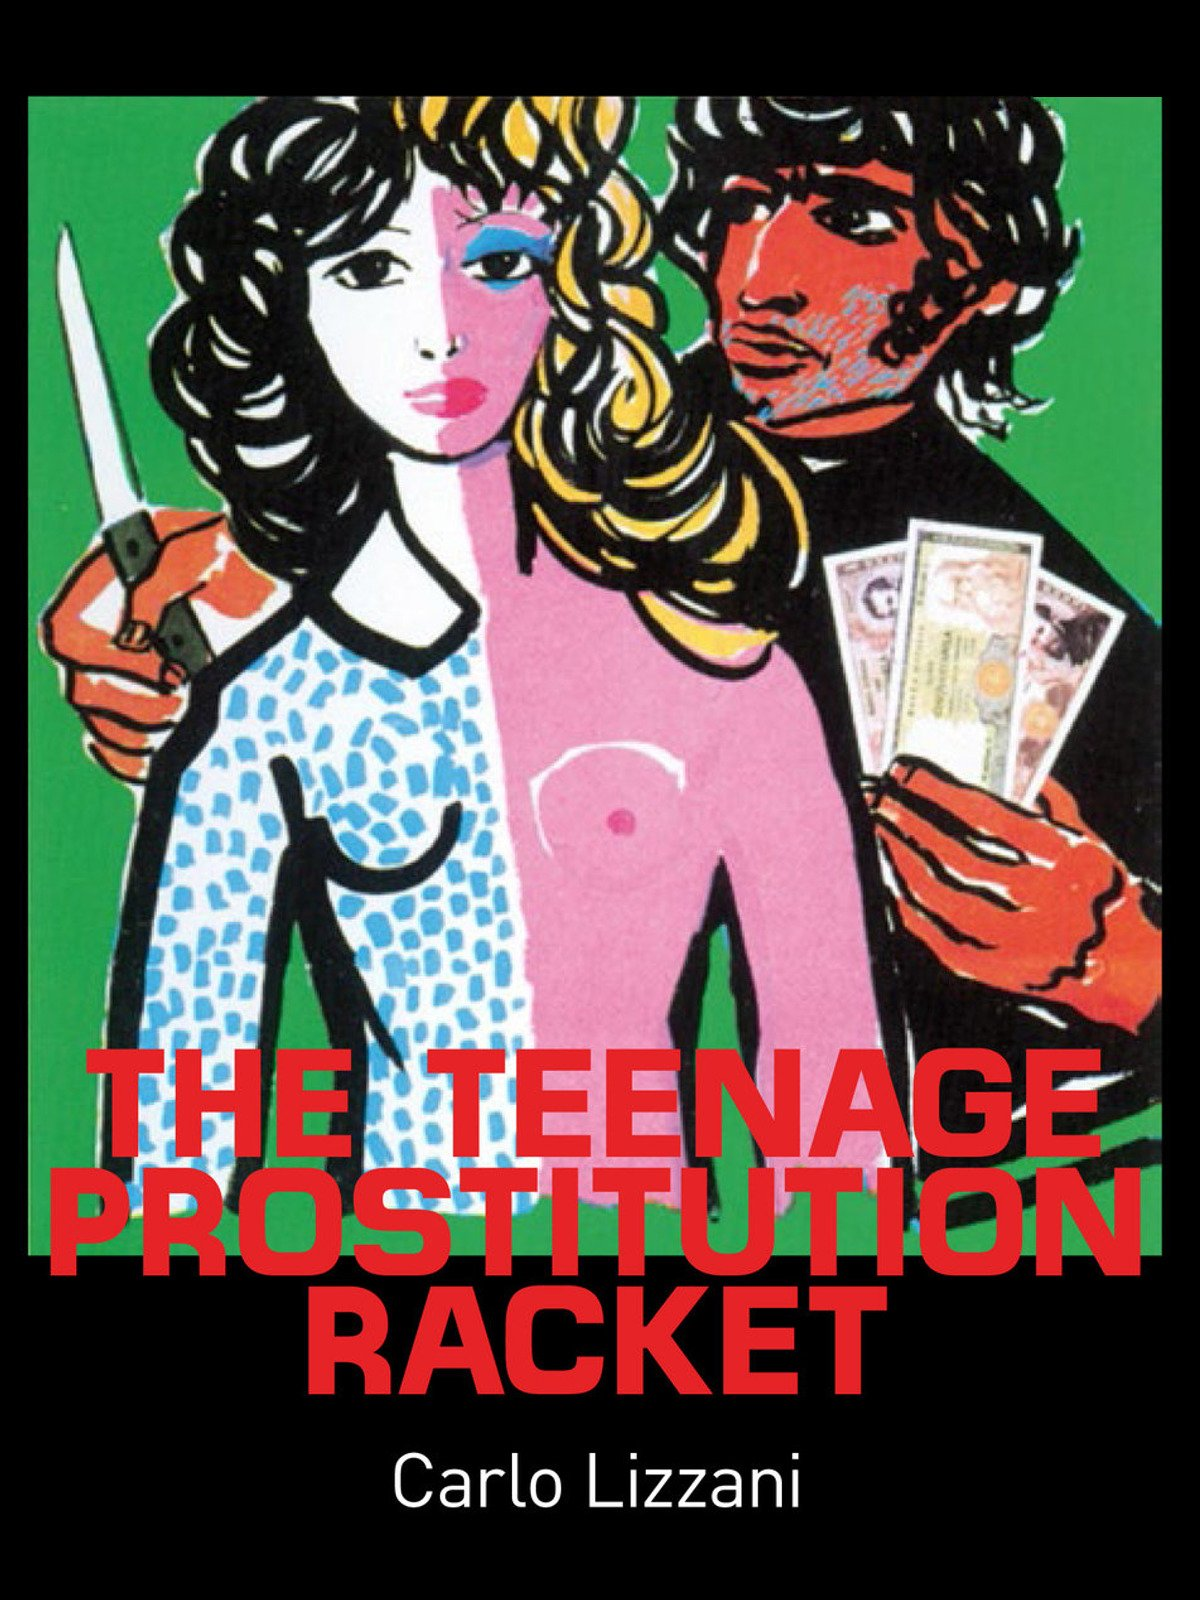 The Teenage Prostitution Racket